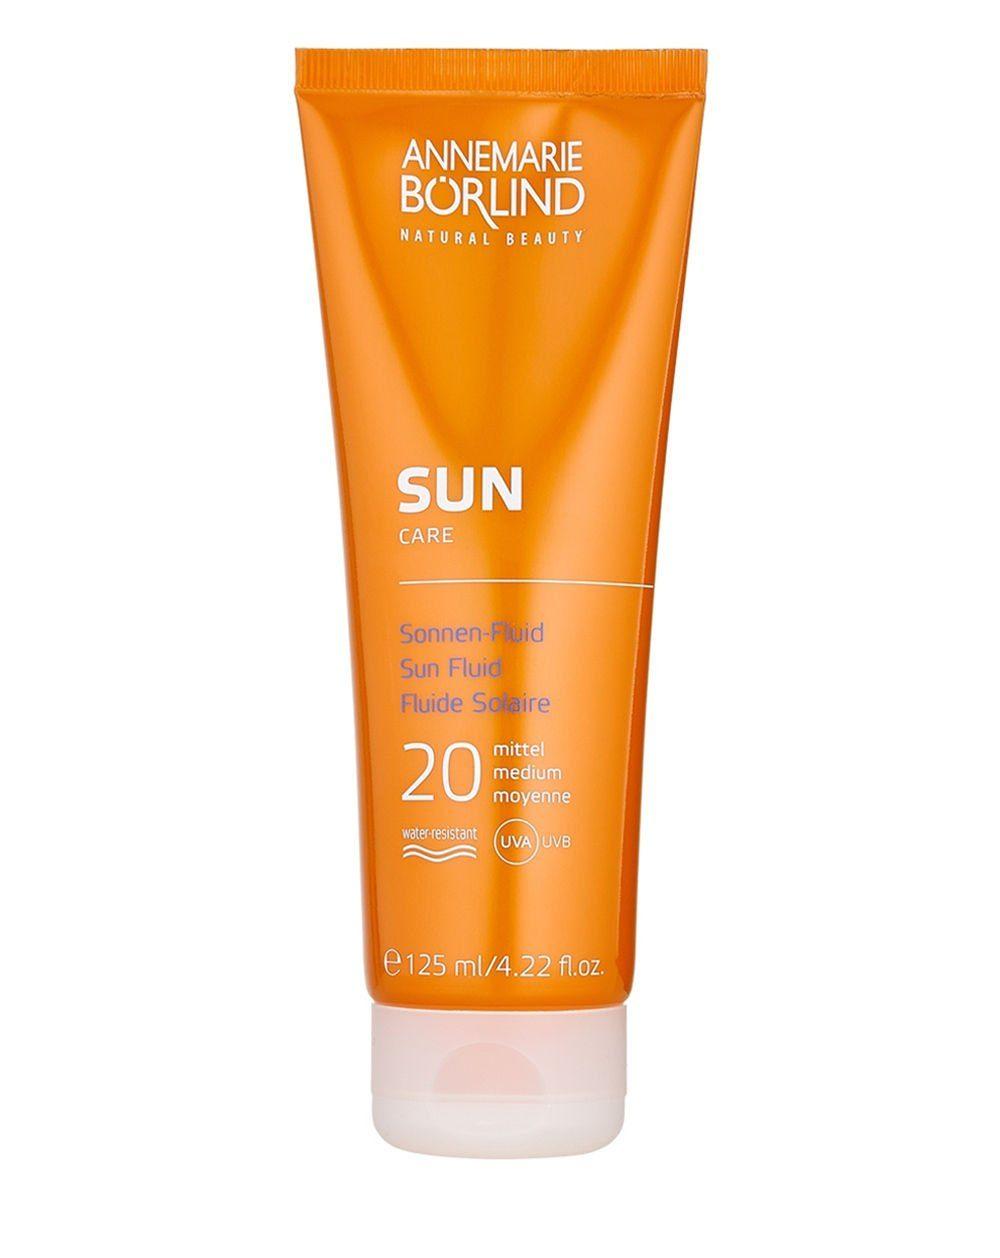 Annemarie Börlind Sonnenfluid »Sun Sonnen-Fluid Lsf20«